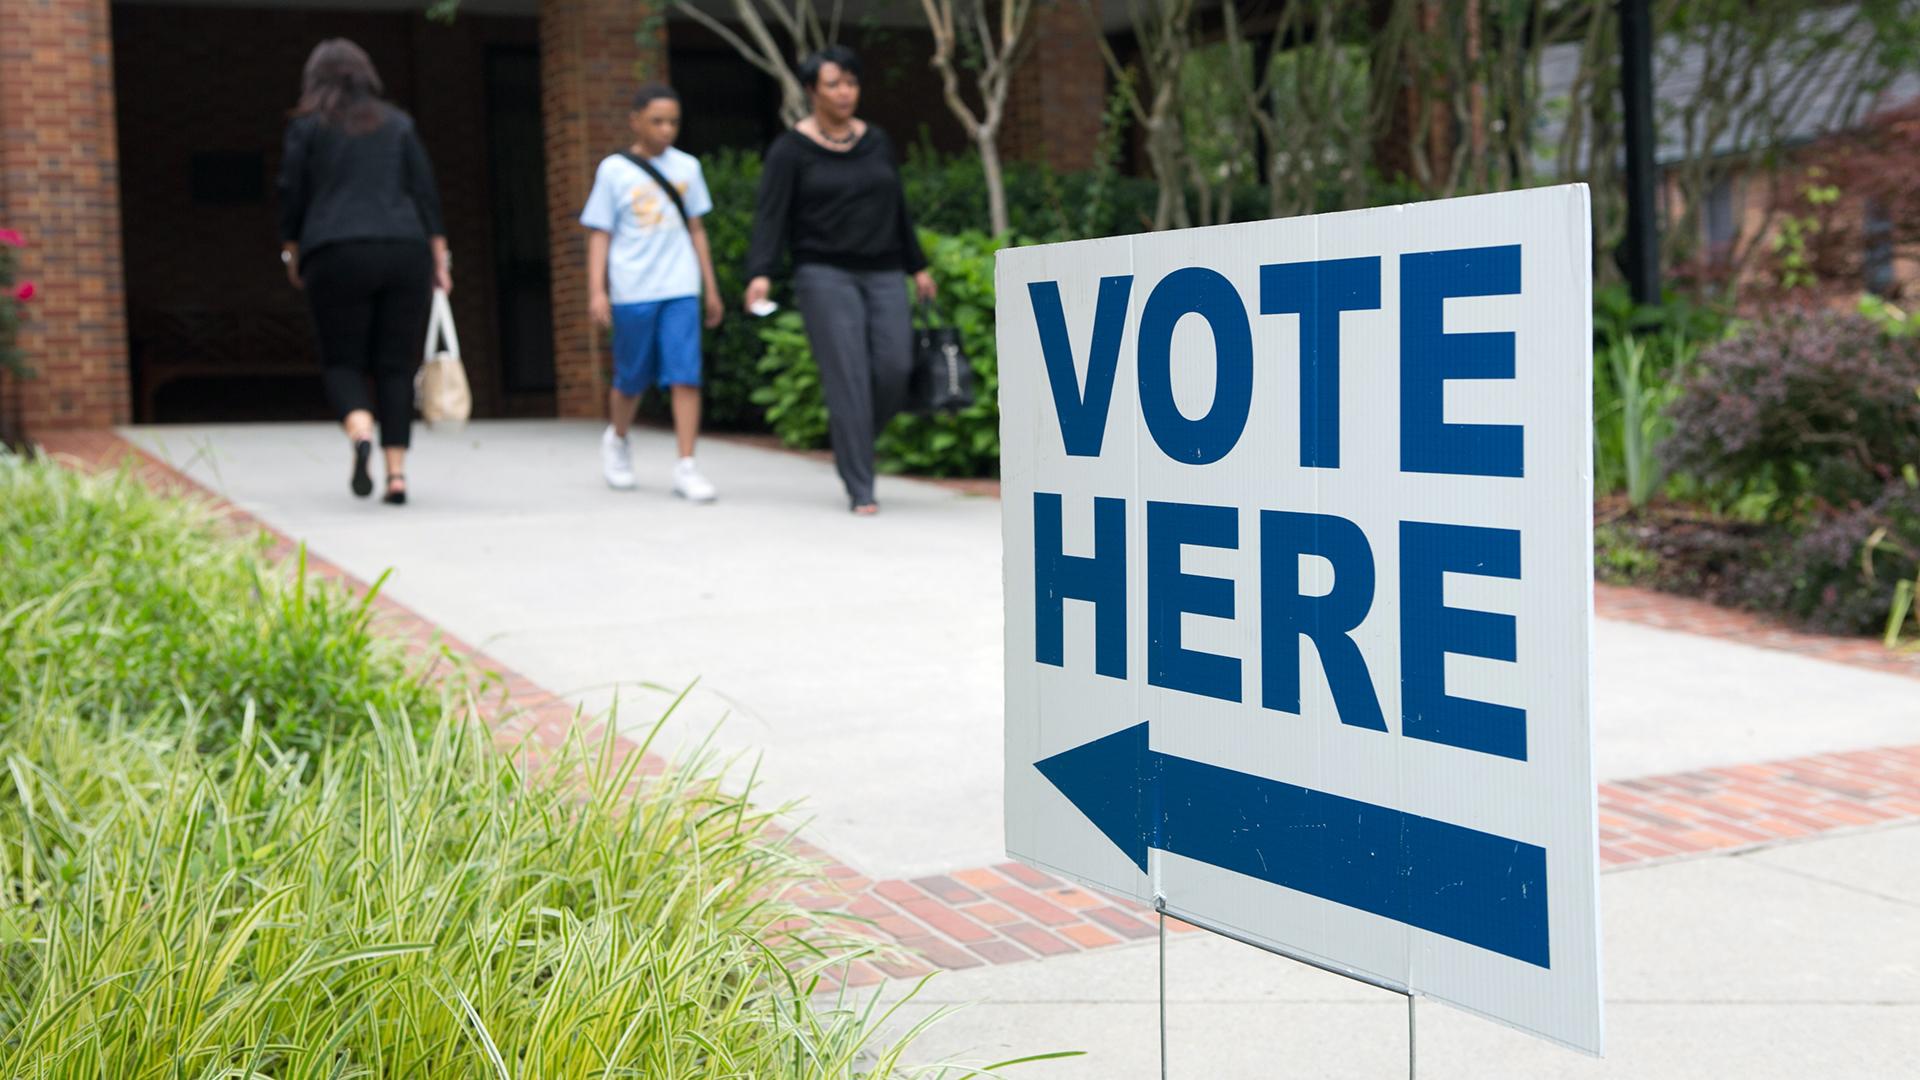 Vote Here Sign Voters Voting-159532-159532.jpg26935149